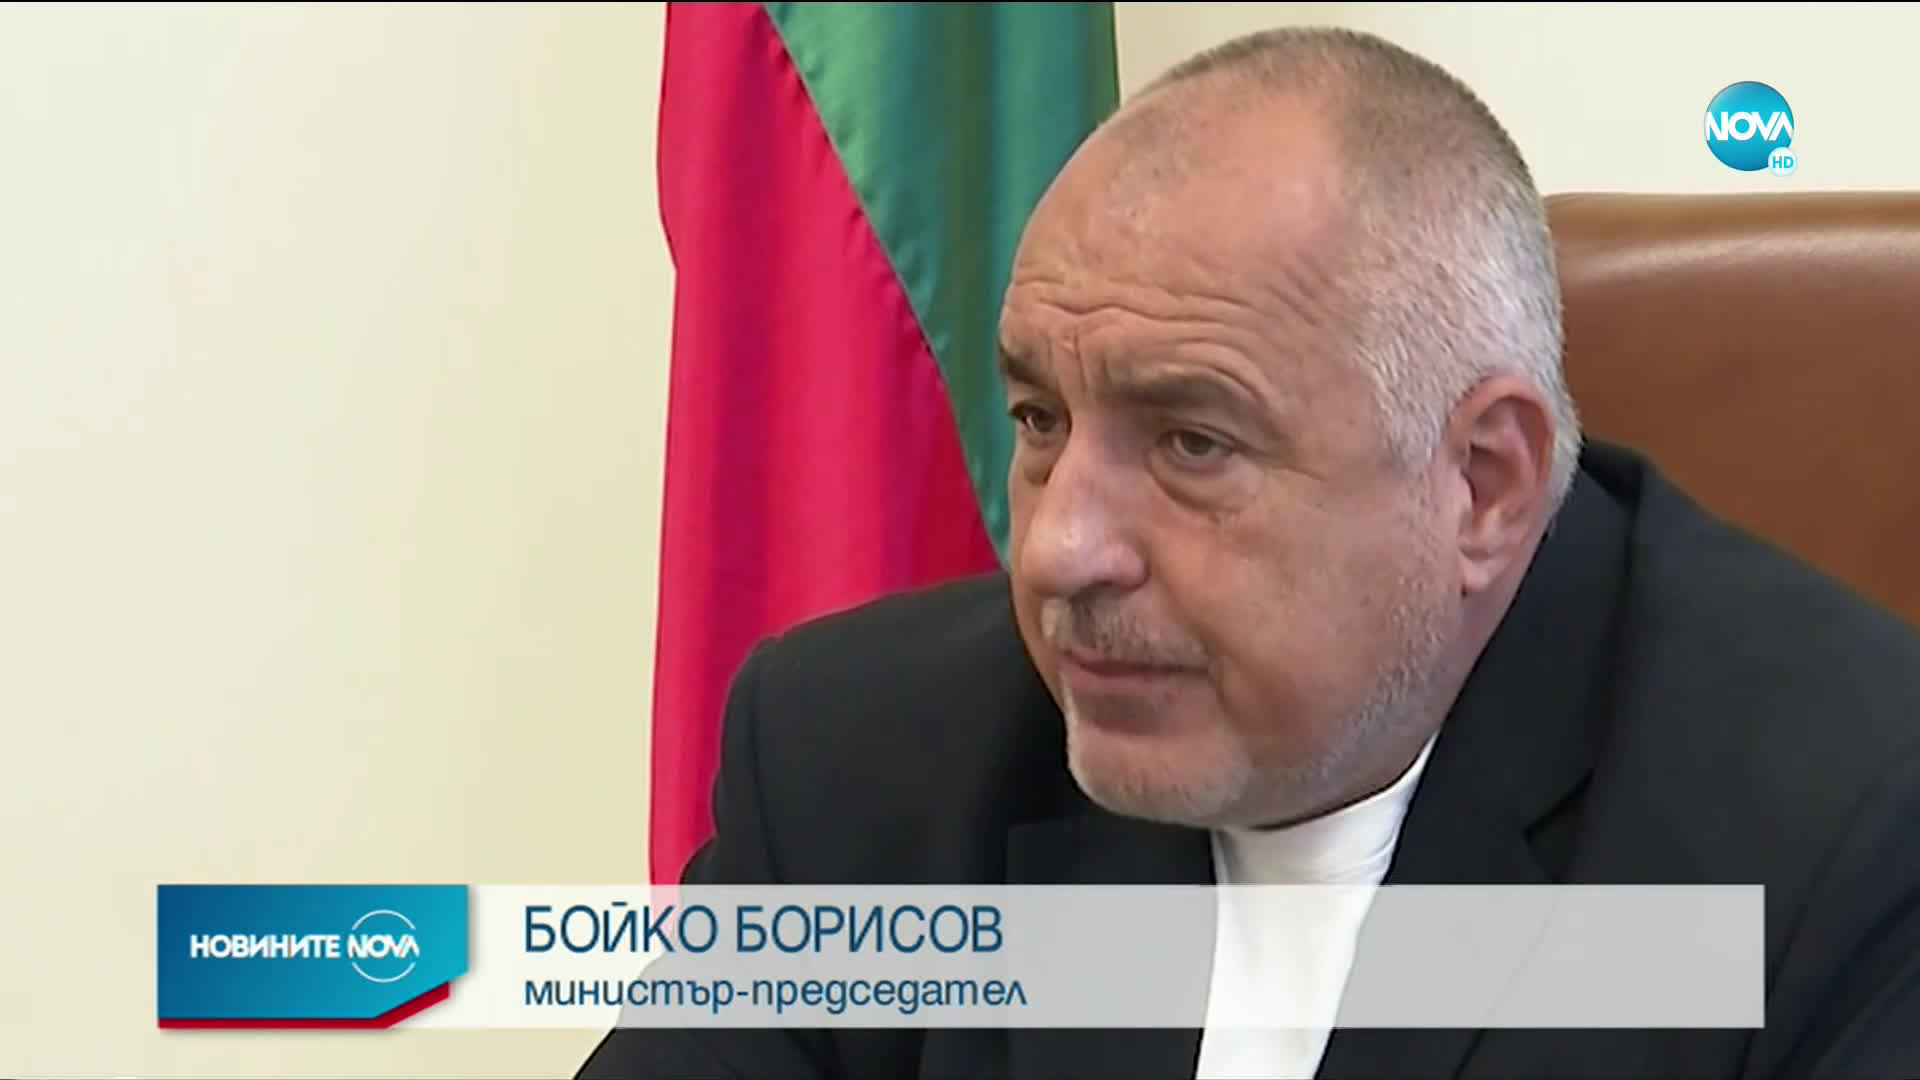 Борисов: Нашата тактика и нашите лекари вършат огромна работа